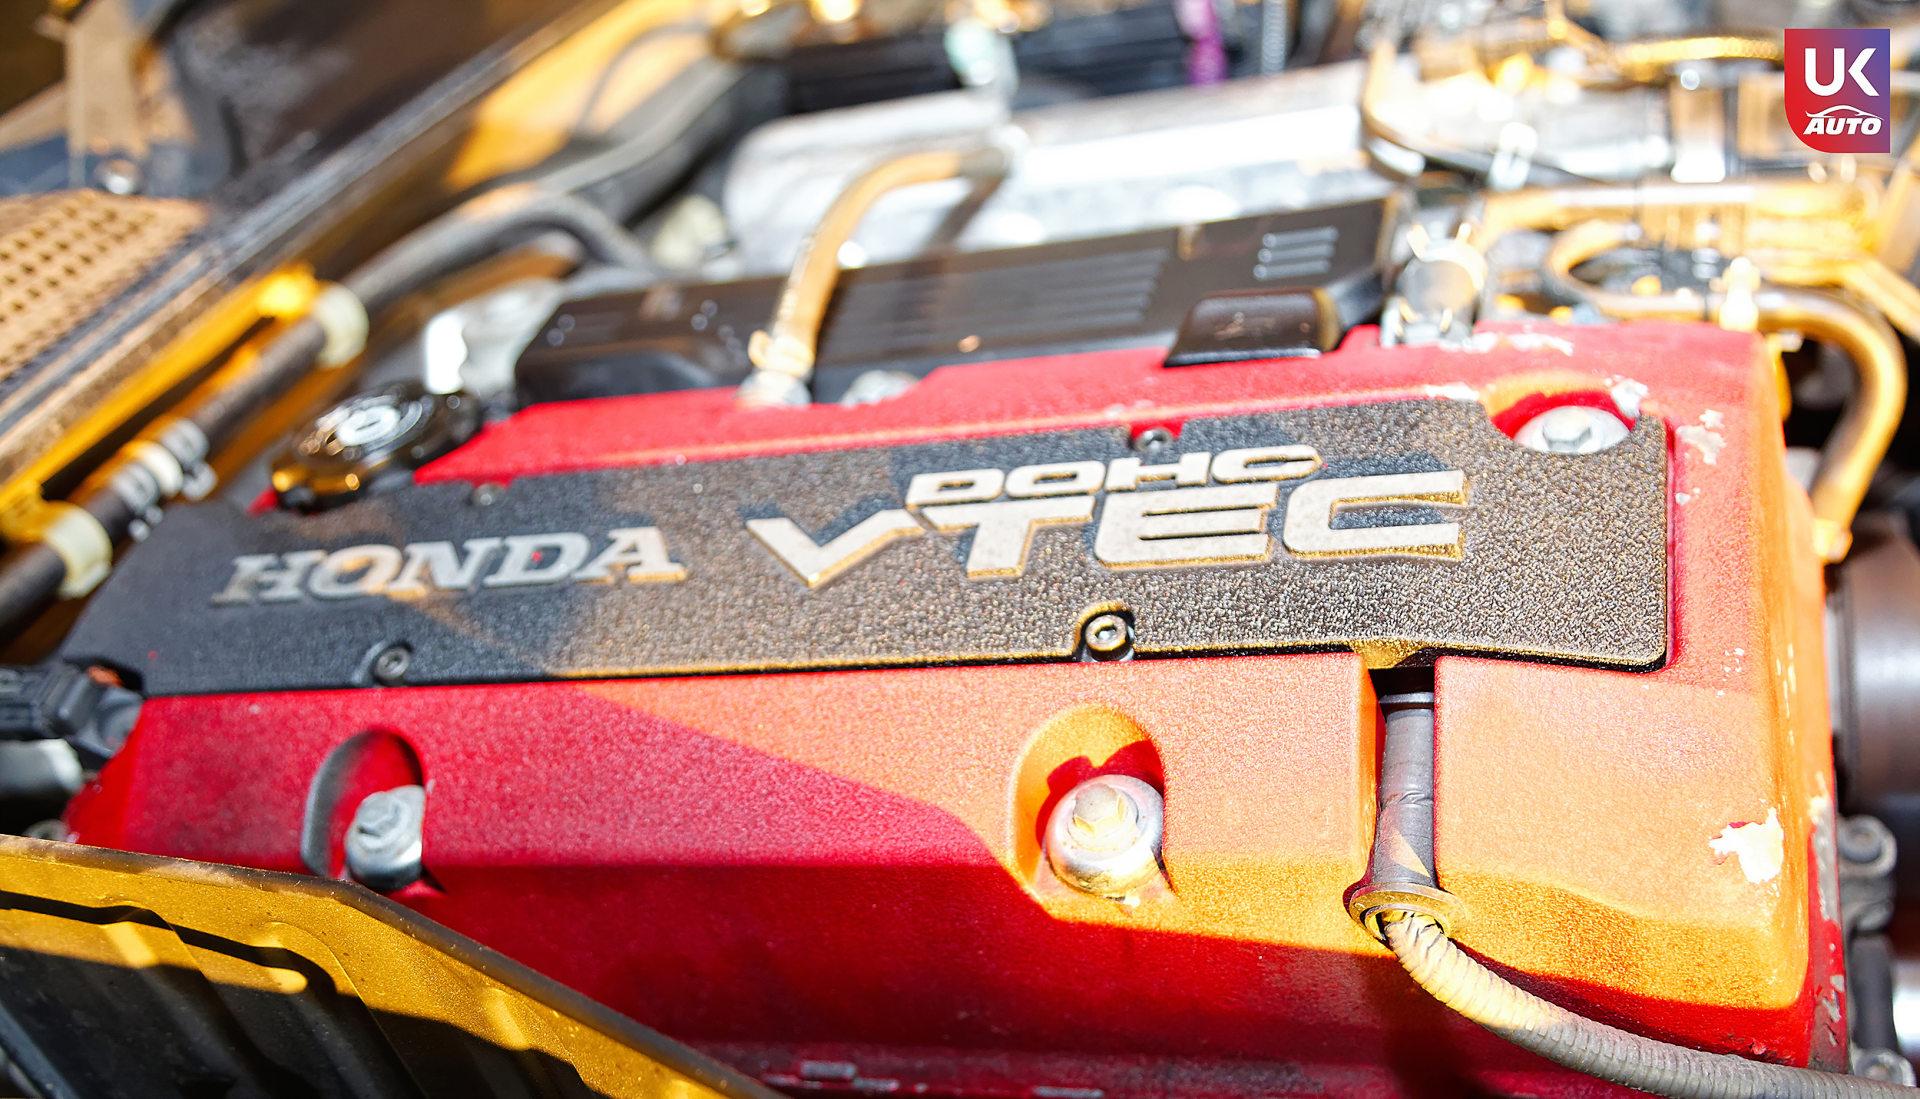 Honda S2000 VTEC RHD UK IMPORT ANGLETERRE HONDA UK ROYAUME UNI11 DxO - Importation angleterre Honda S2000 rhd VTEC honda Royaume uni Felicitation a Alexis